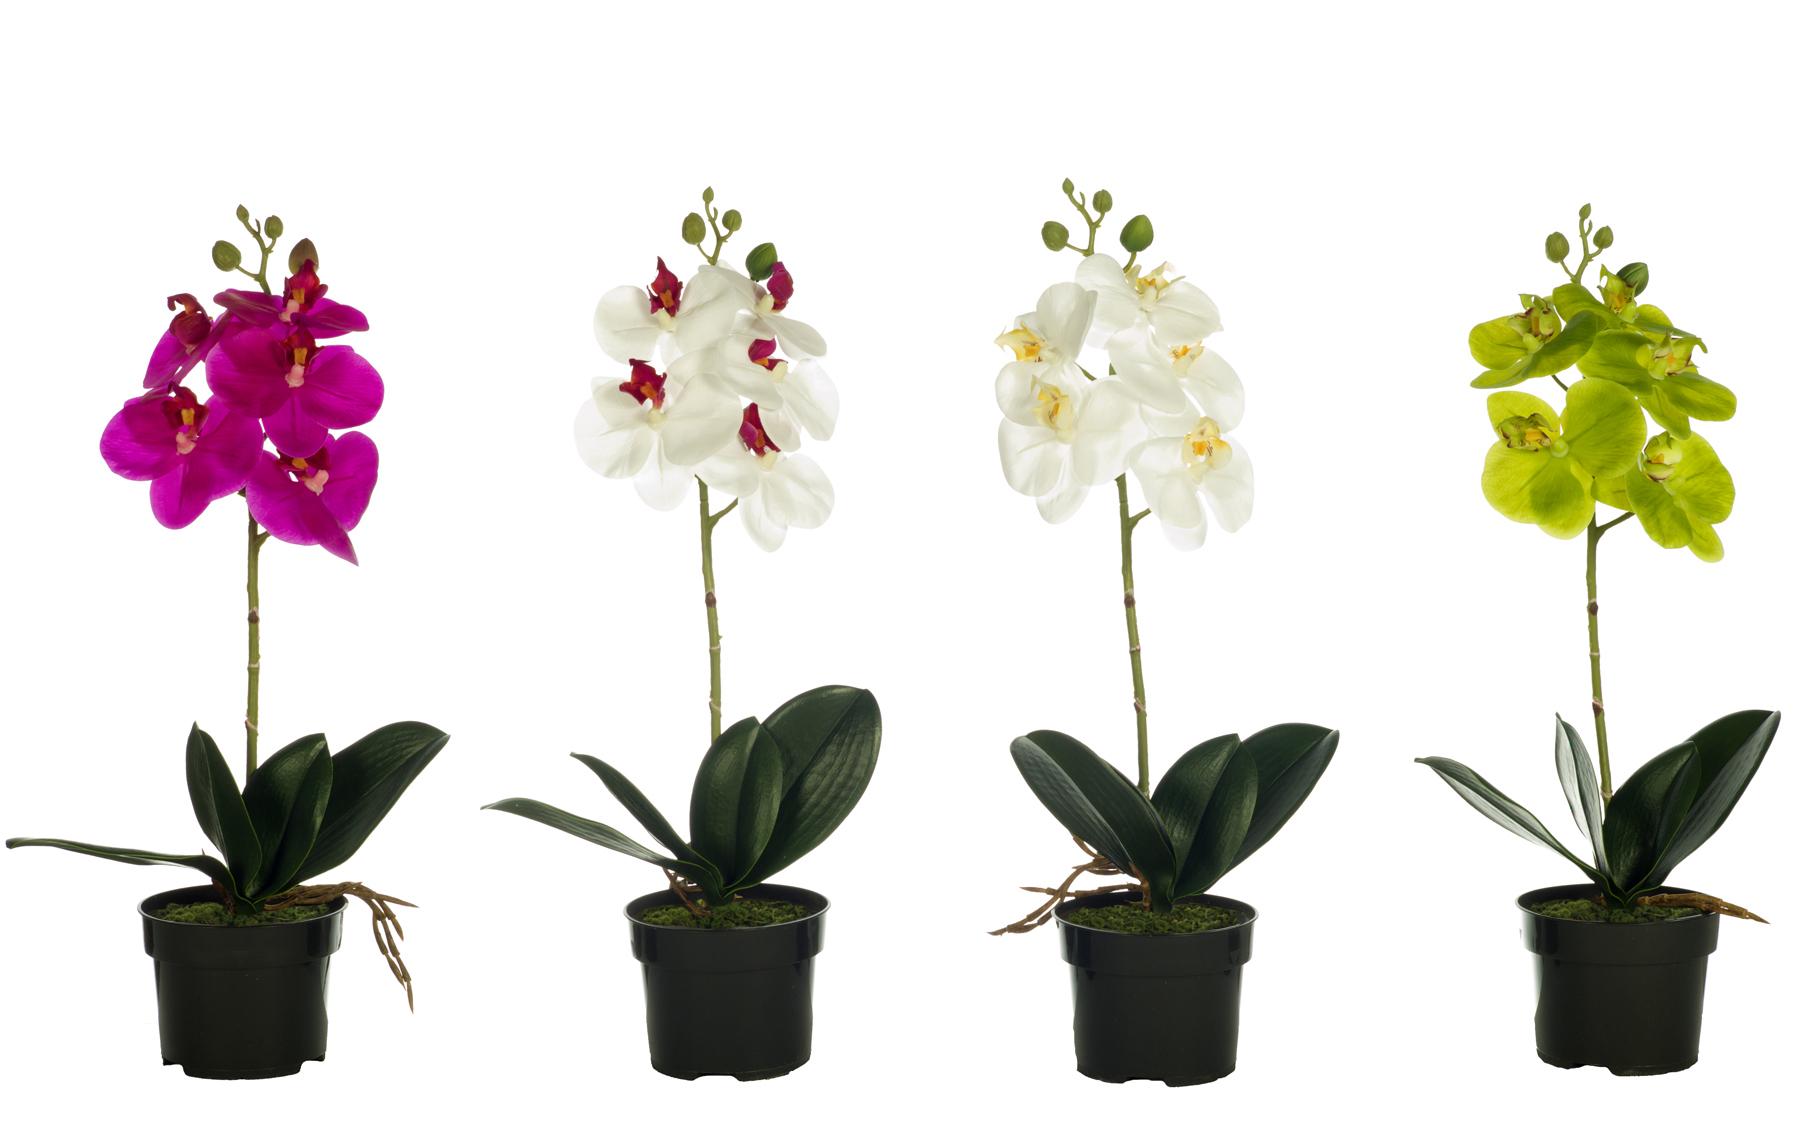 orquidea artificial www.floresymuchomas.com